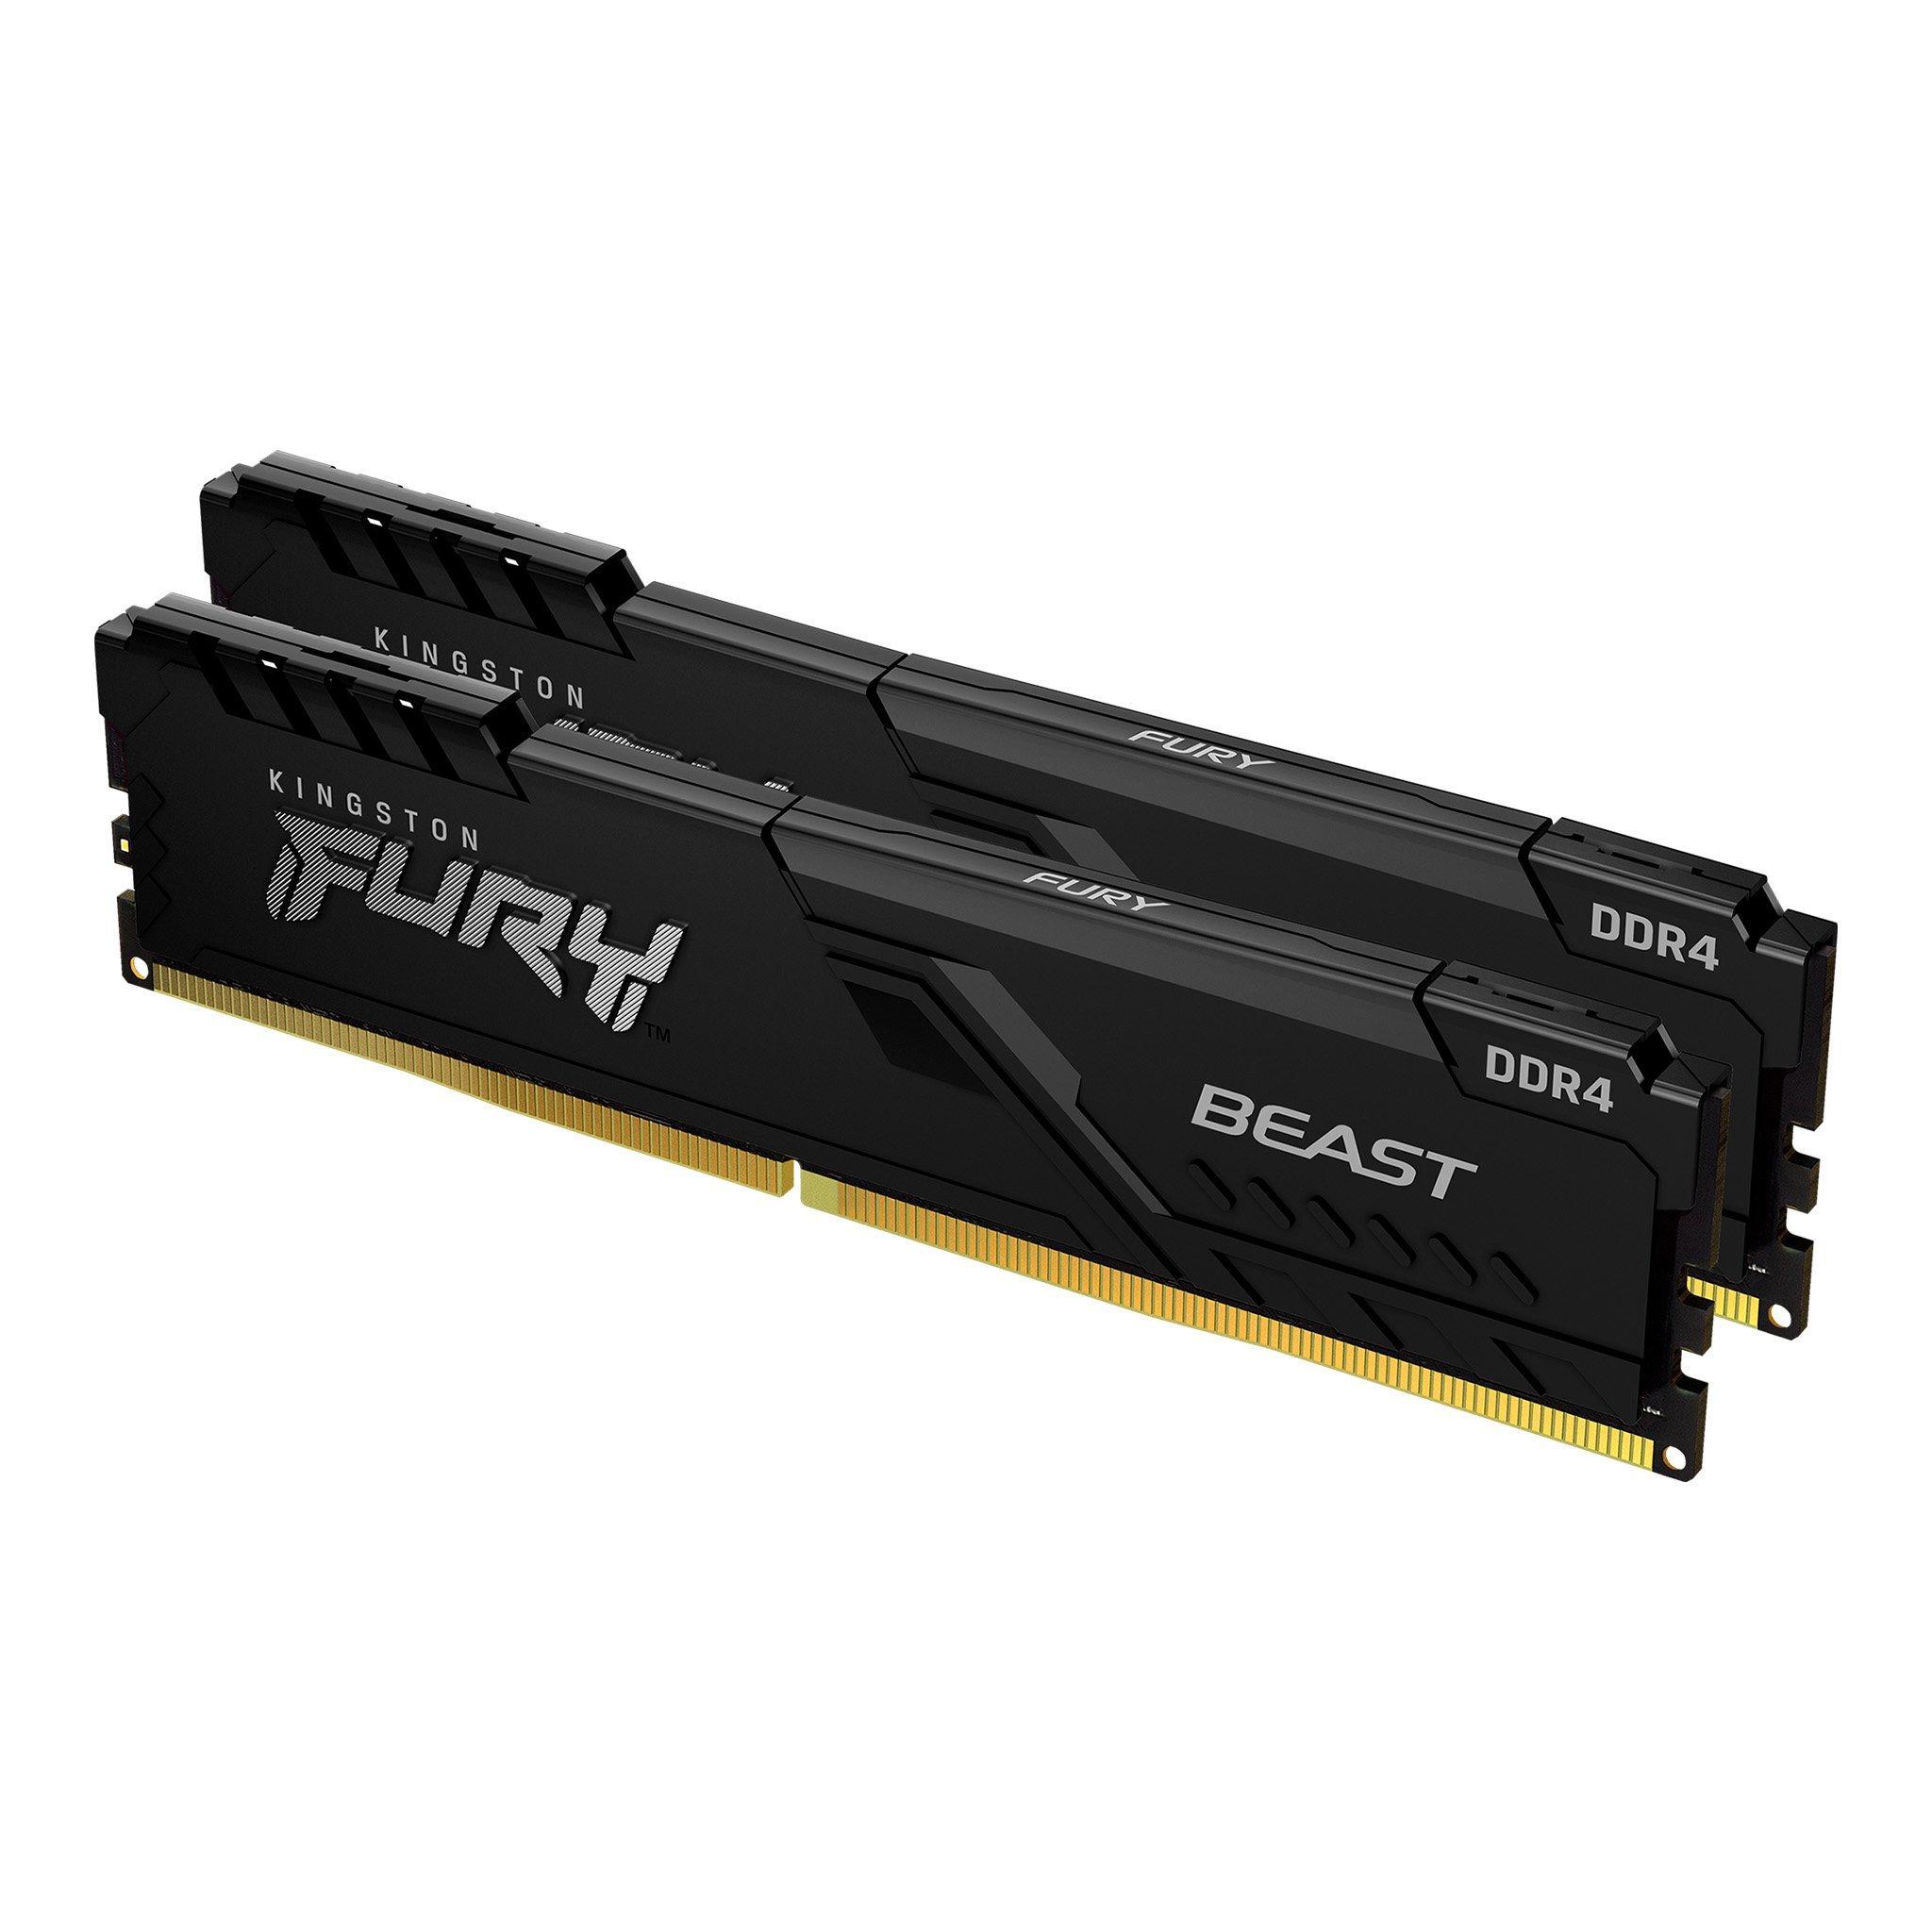 Памет Kingston FURY Beast Black 32GB(2x16GB) DDR4 PC4-25600 3200MHz CL16 KF432C16BB1K2/32